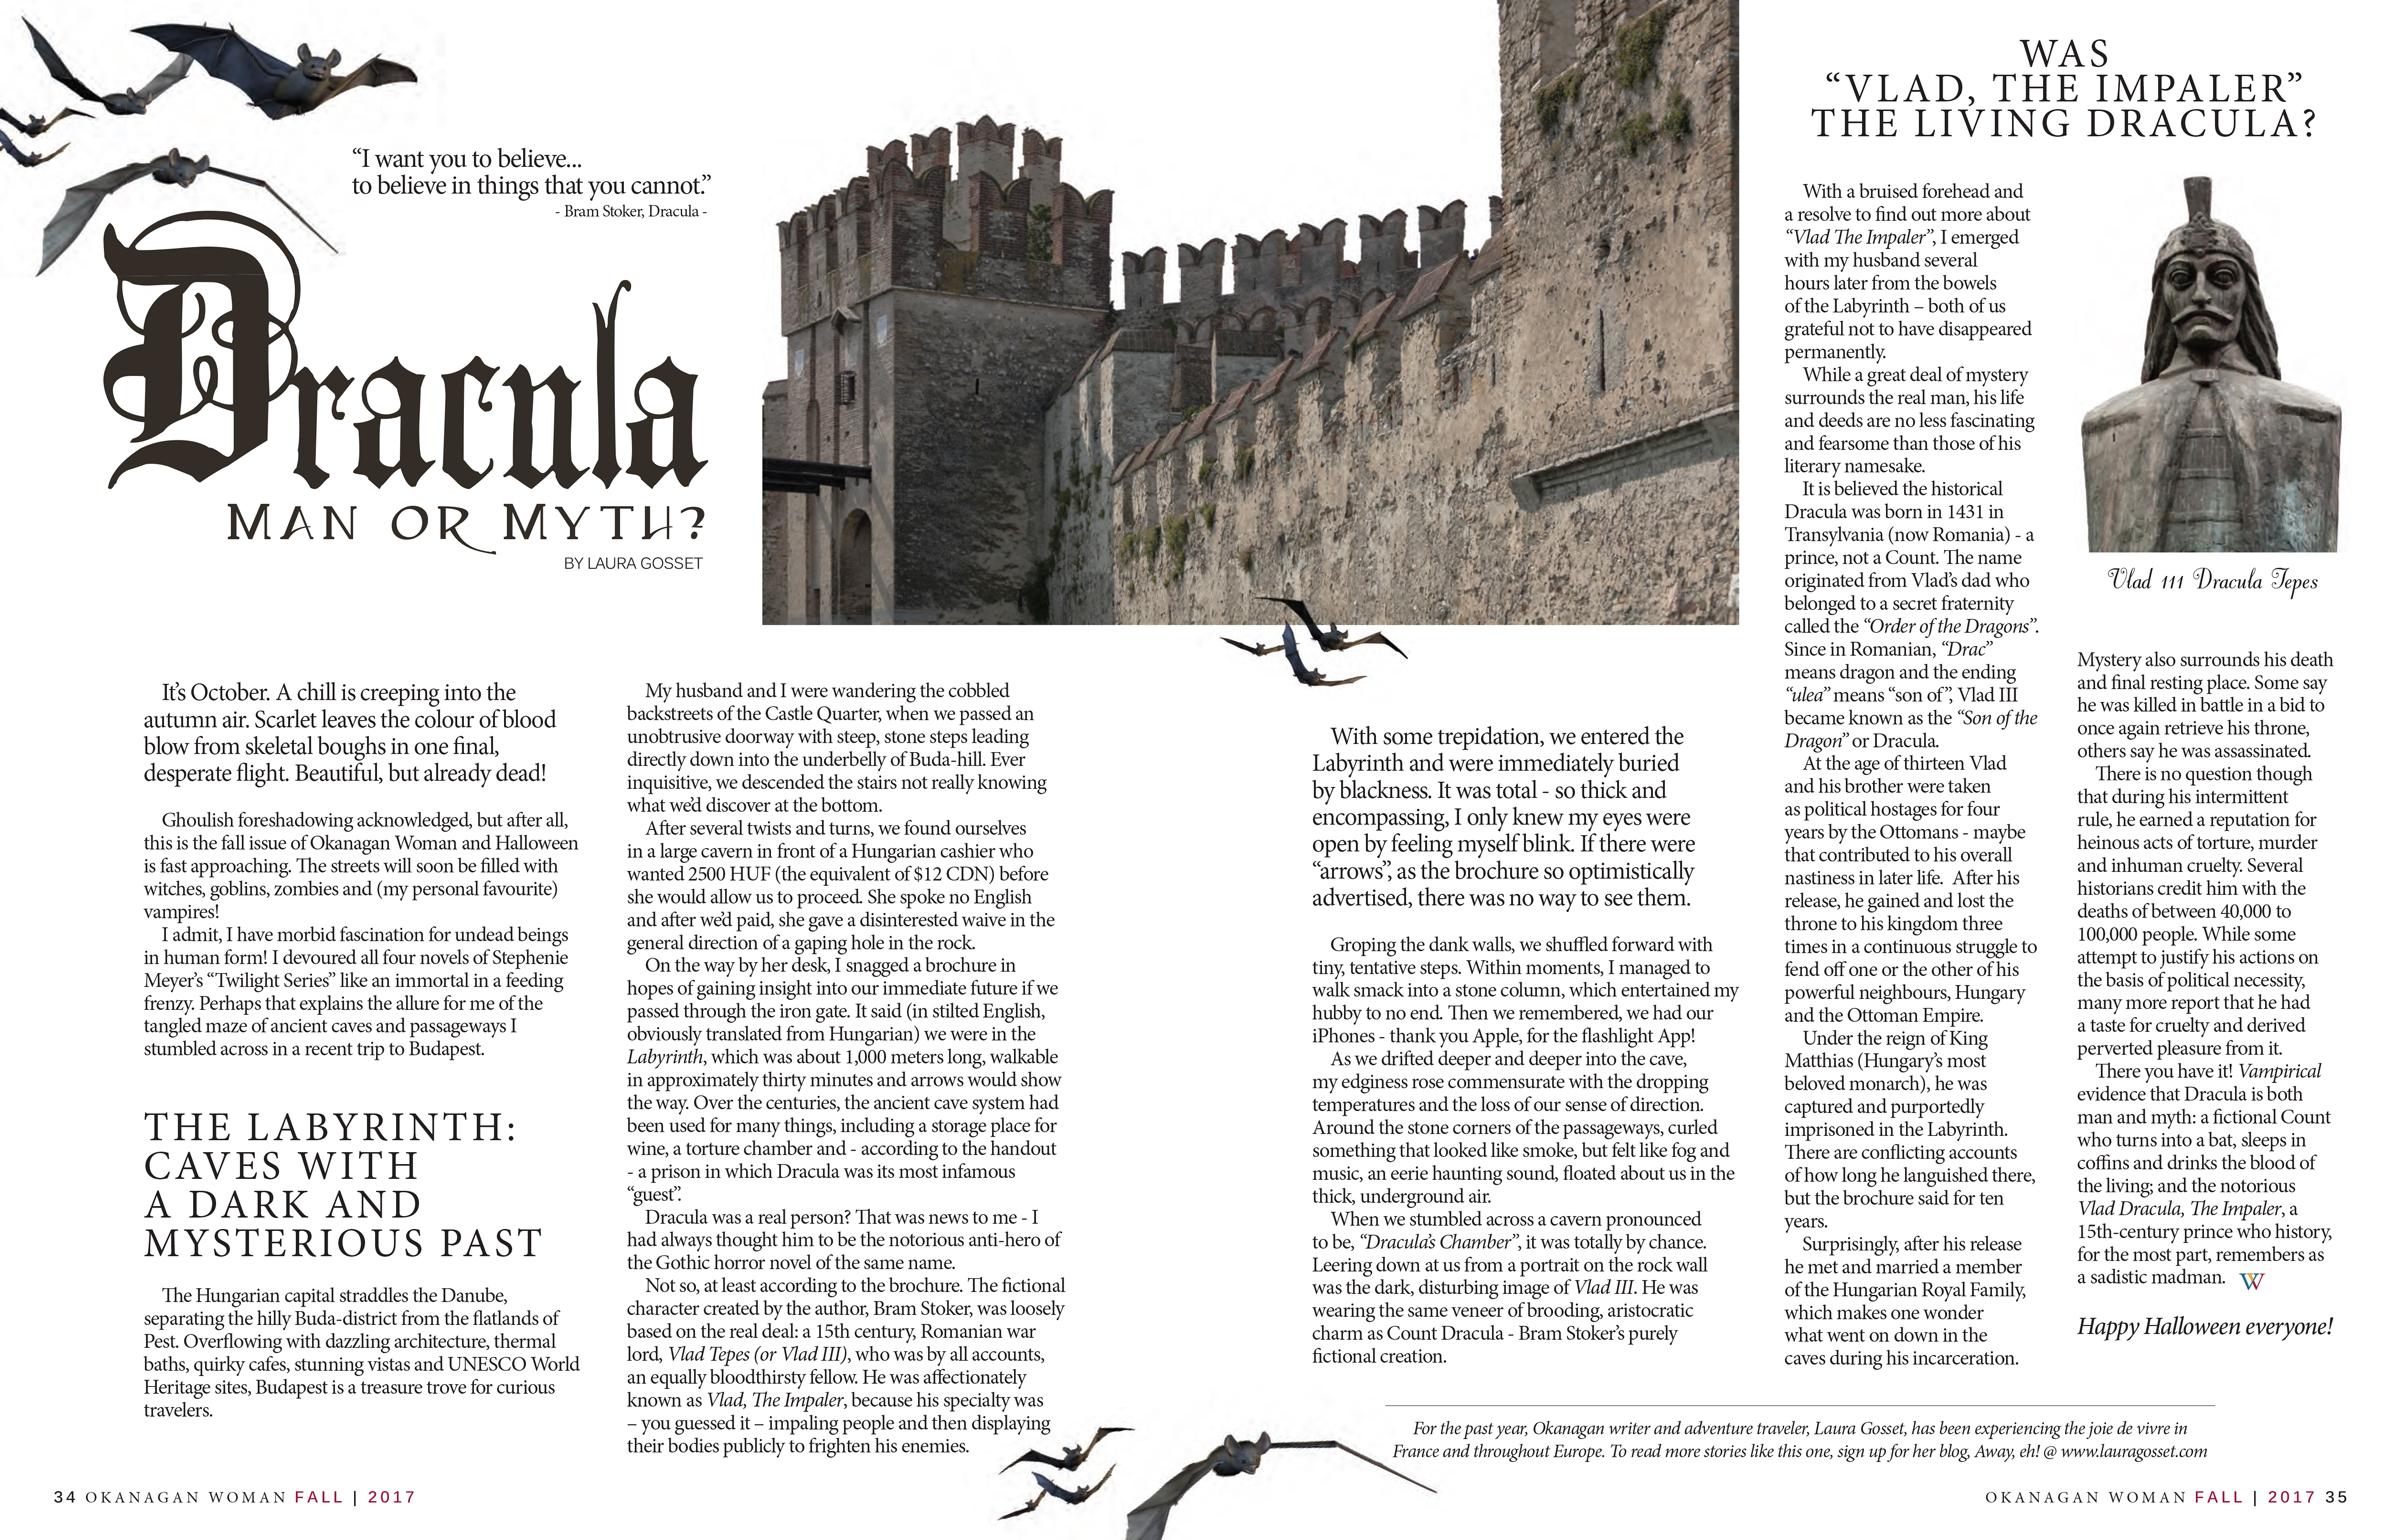 Dracula-2400pxW.jpg